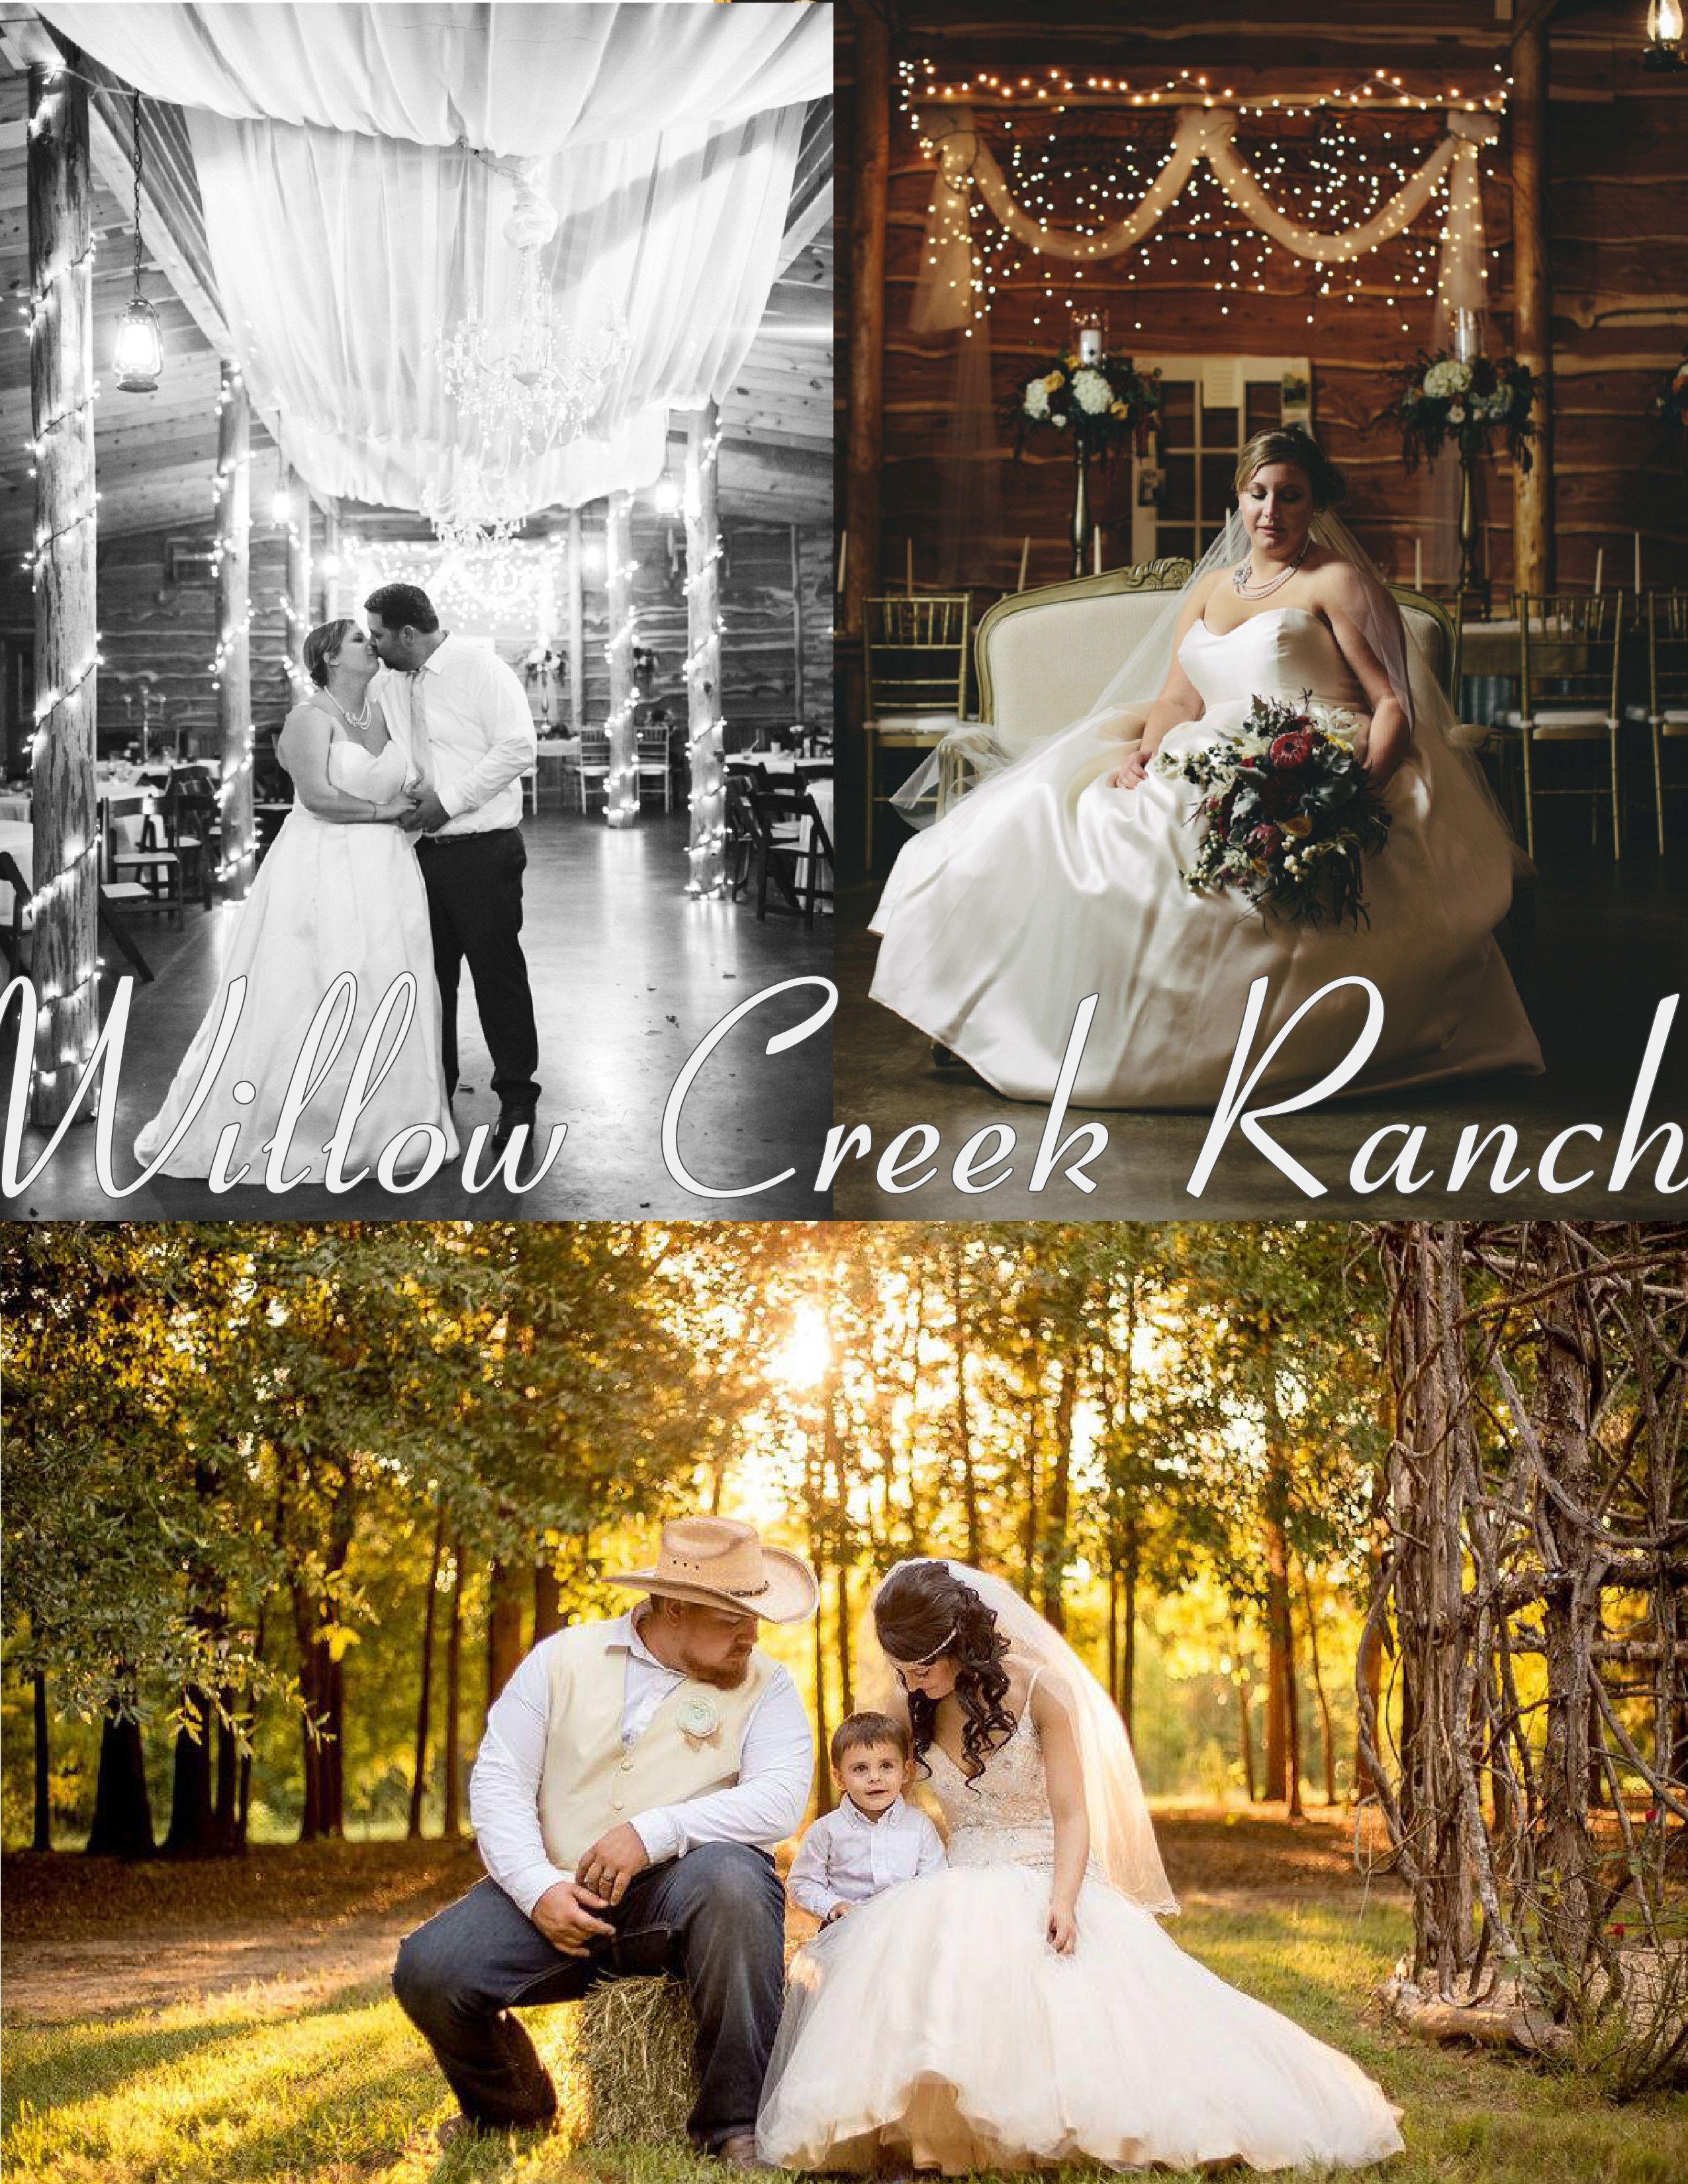 Wedding Venues In East Texas.Www Thewillowcreekranchtx Com Rustic Barn Wedding Venue Tyler